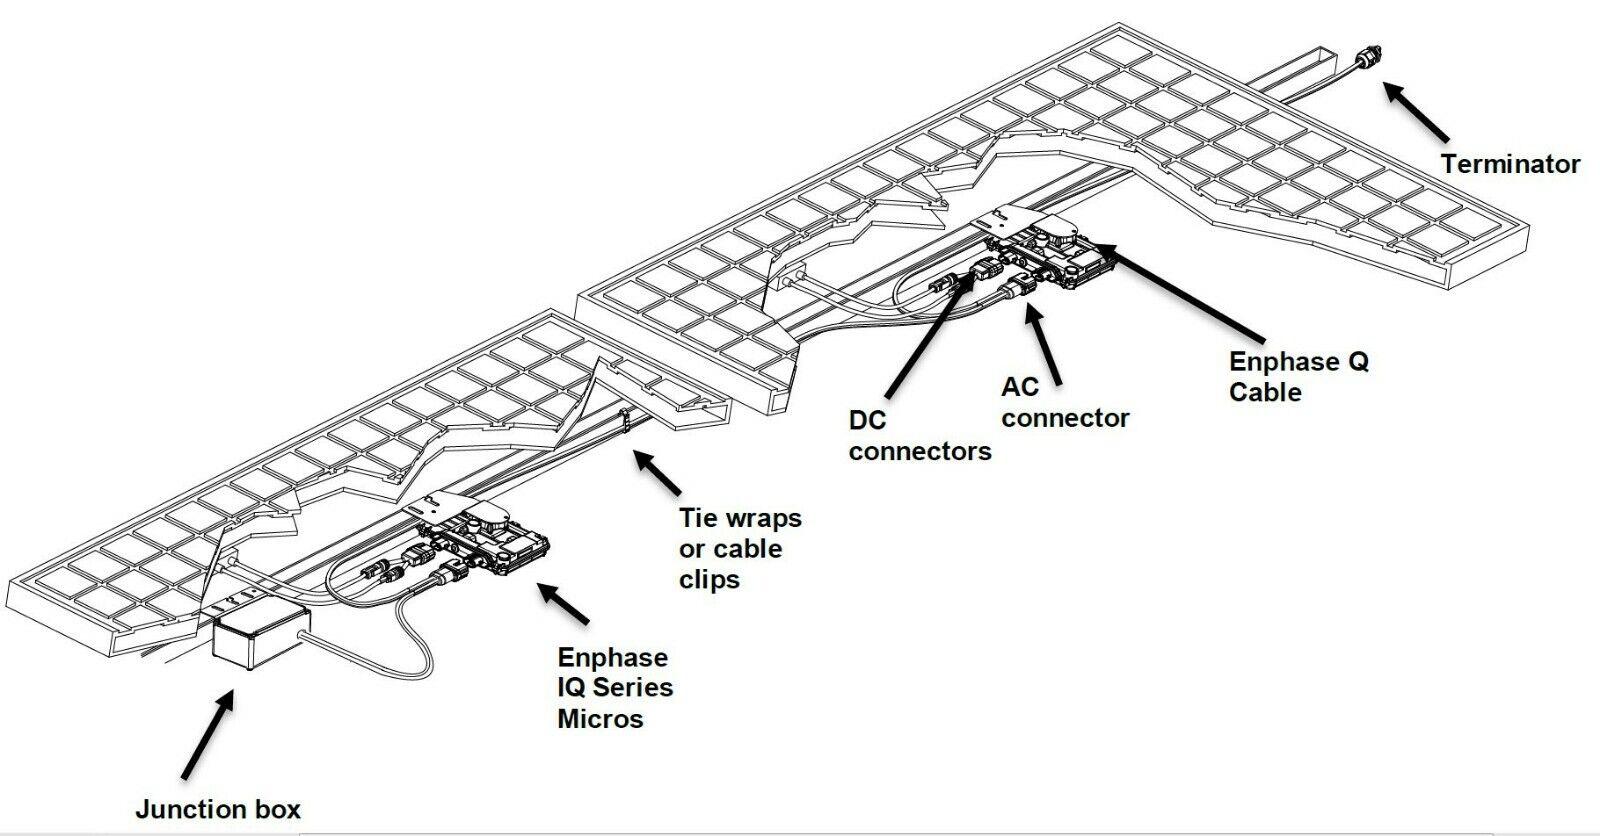 Enphase Iq40 Grid Tie Solar Micro Inverter Iq40 400 40 us 400 Cell